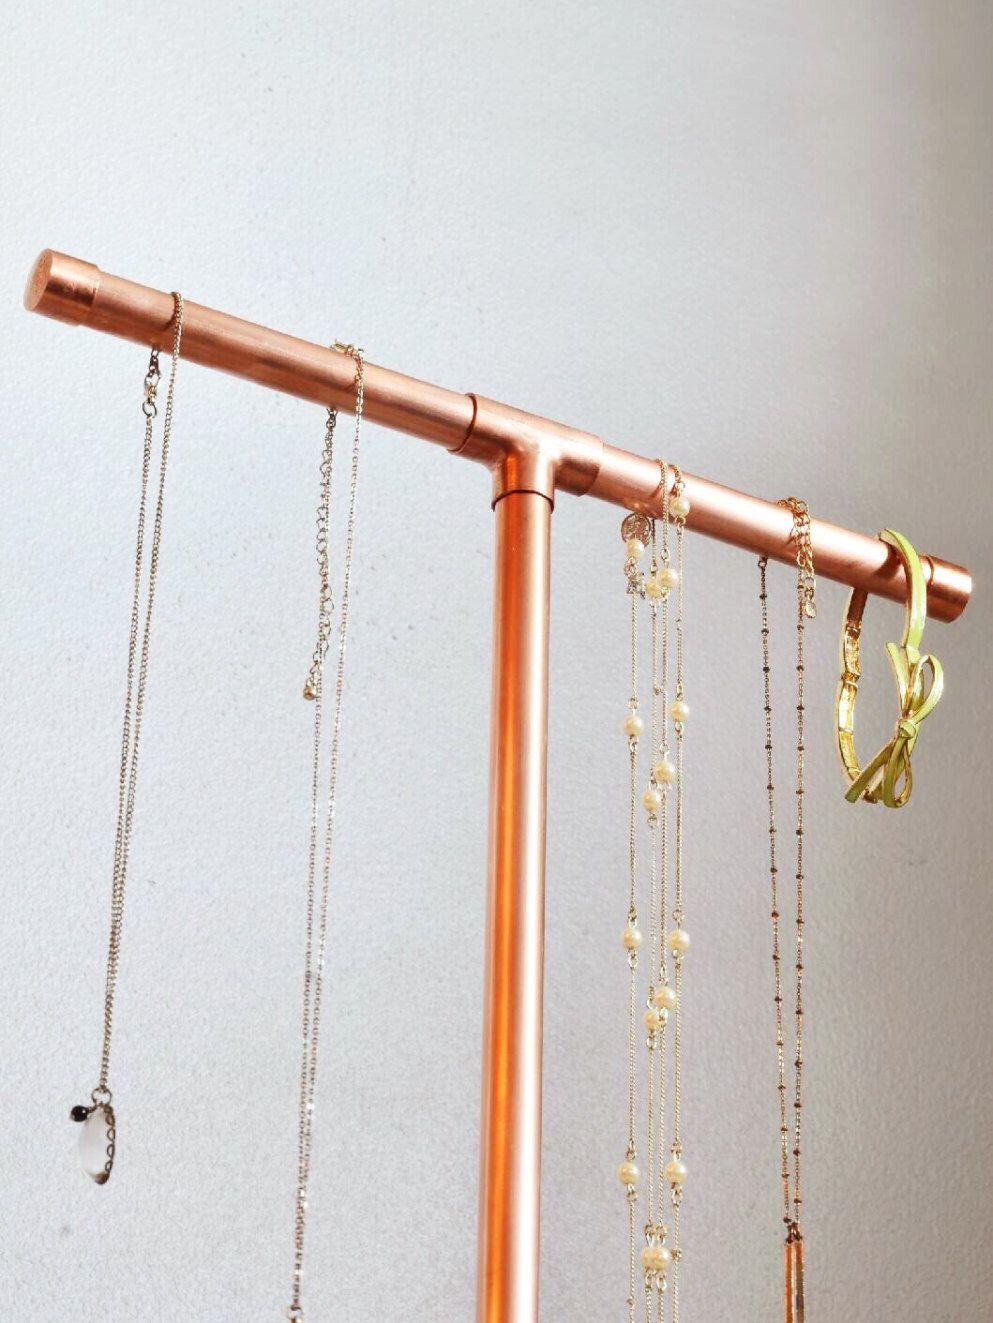 Copper Jewelry Display (3 Sizes) - Jewelry Stand - Jewelry Organizer by DIYobsessedStore on Etsy https://www.etsy.com/uk/listing/293838753/copper-jewelry-display-3-sizes-jewelry